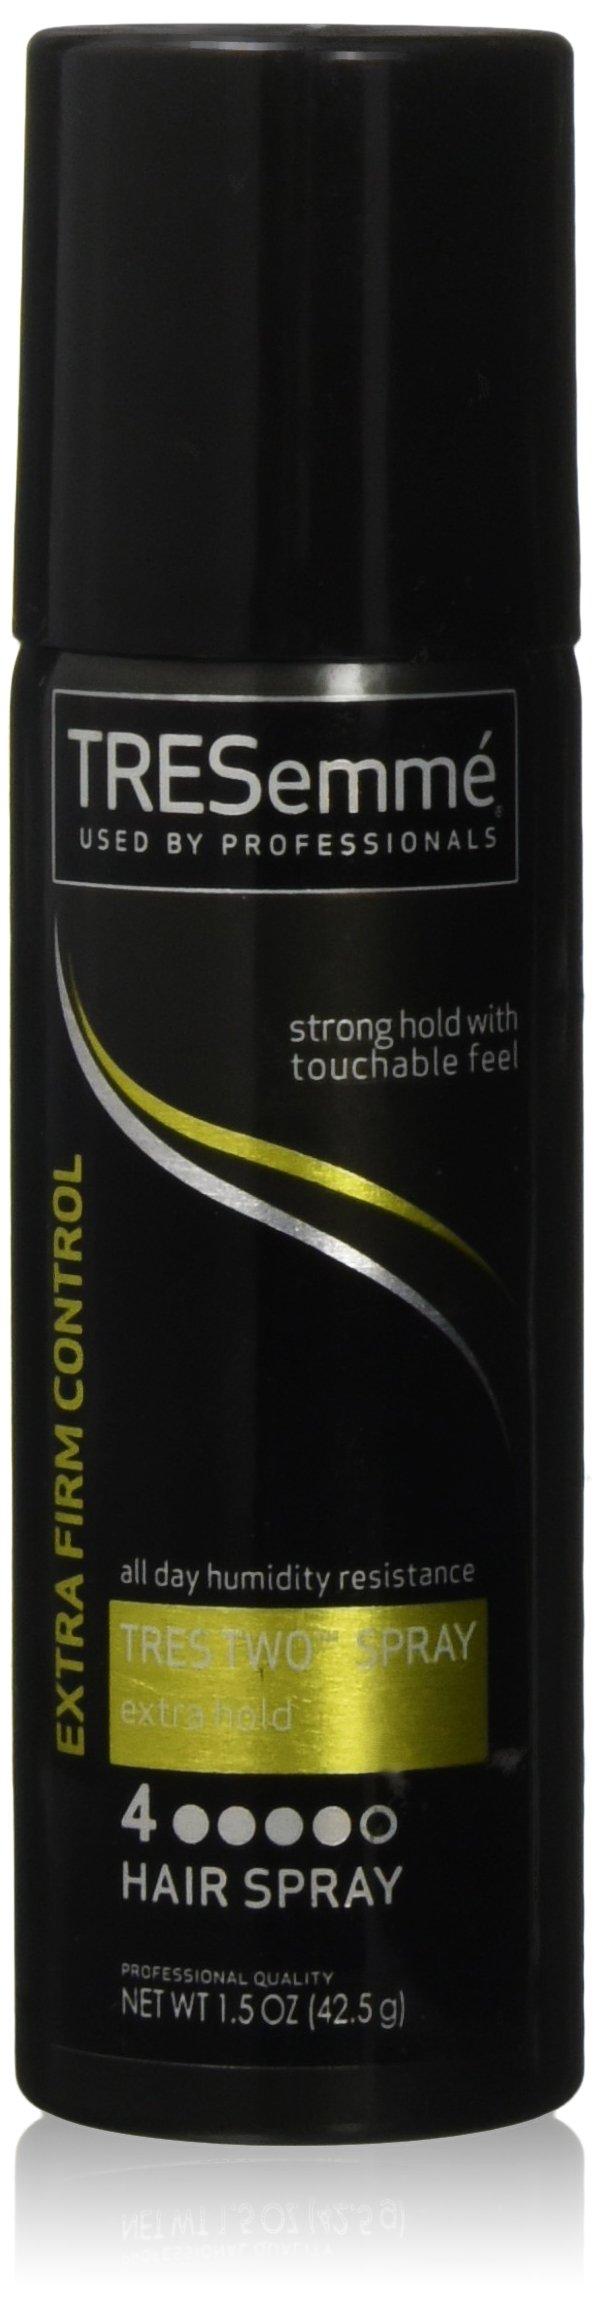 Tresemme Tres Two Extra Hold Hair Spray, 1.5 Ounce